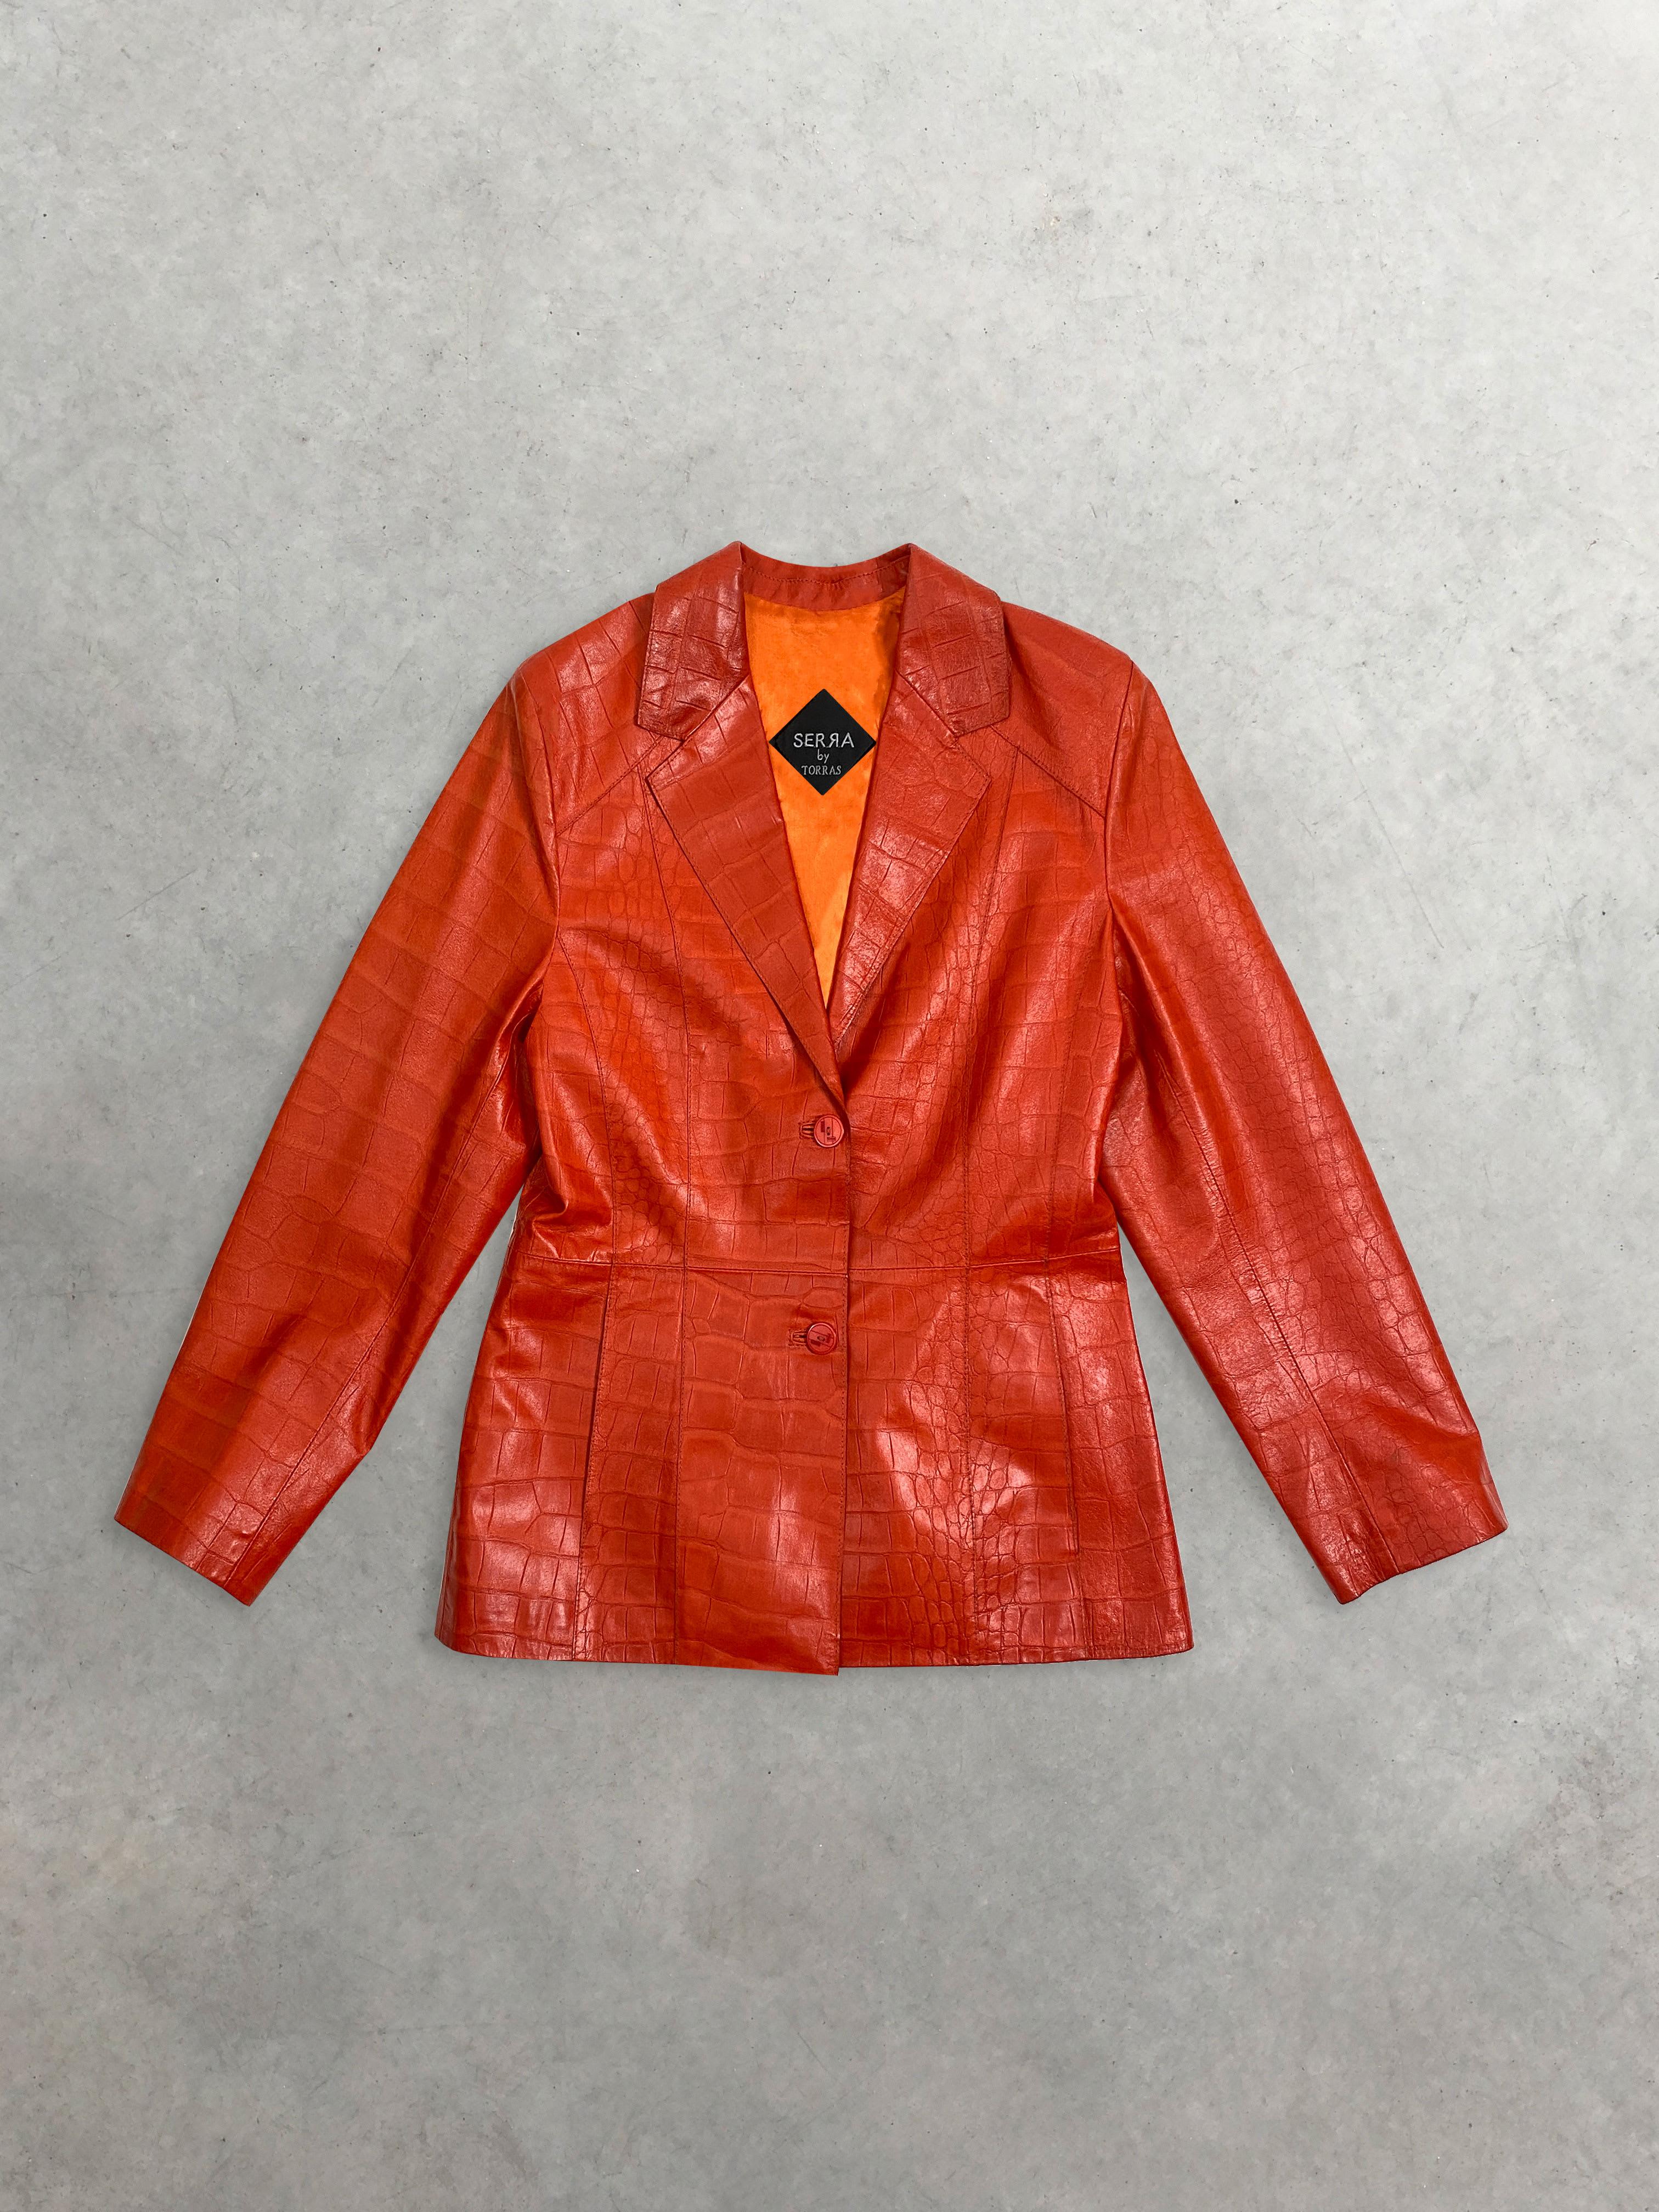 Packshot de Veste Tailleur en Cuir Orange Serra by Torras Vintage par la marque Vintage